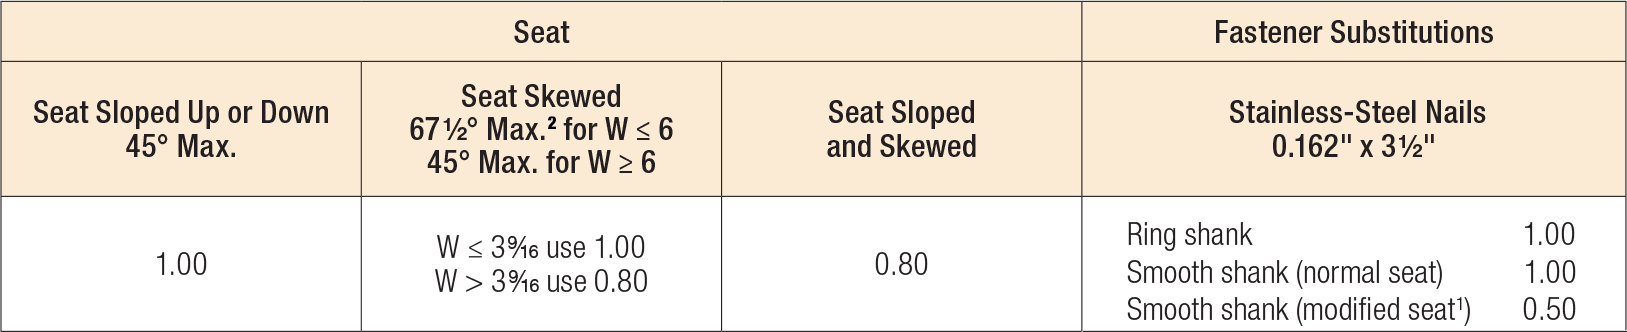 U/HU/HUC Series Modifications and Associated Load Reductions